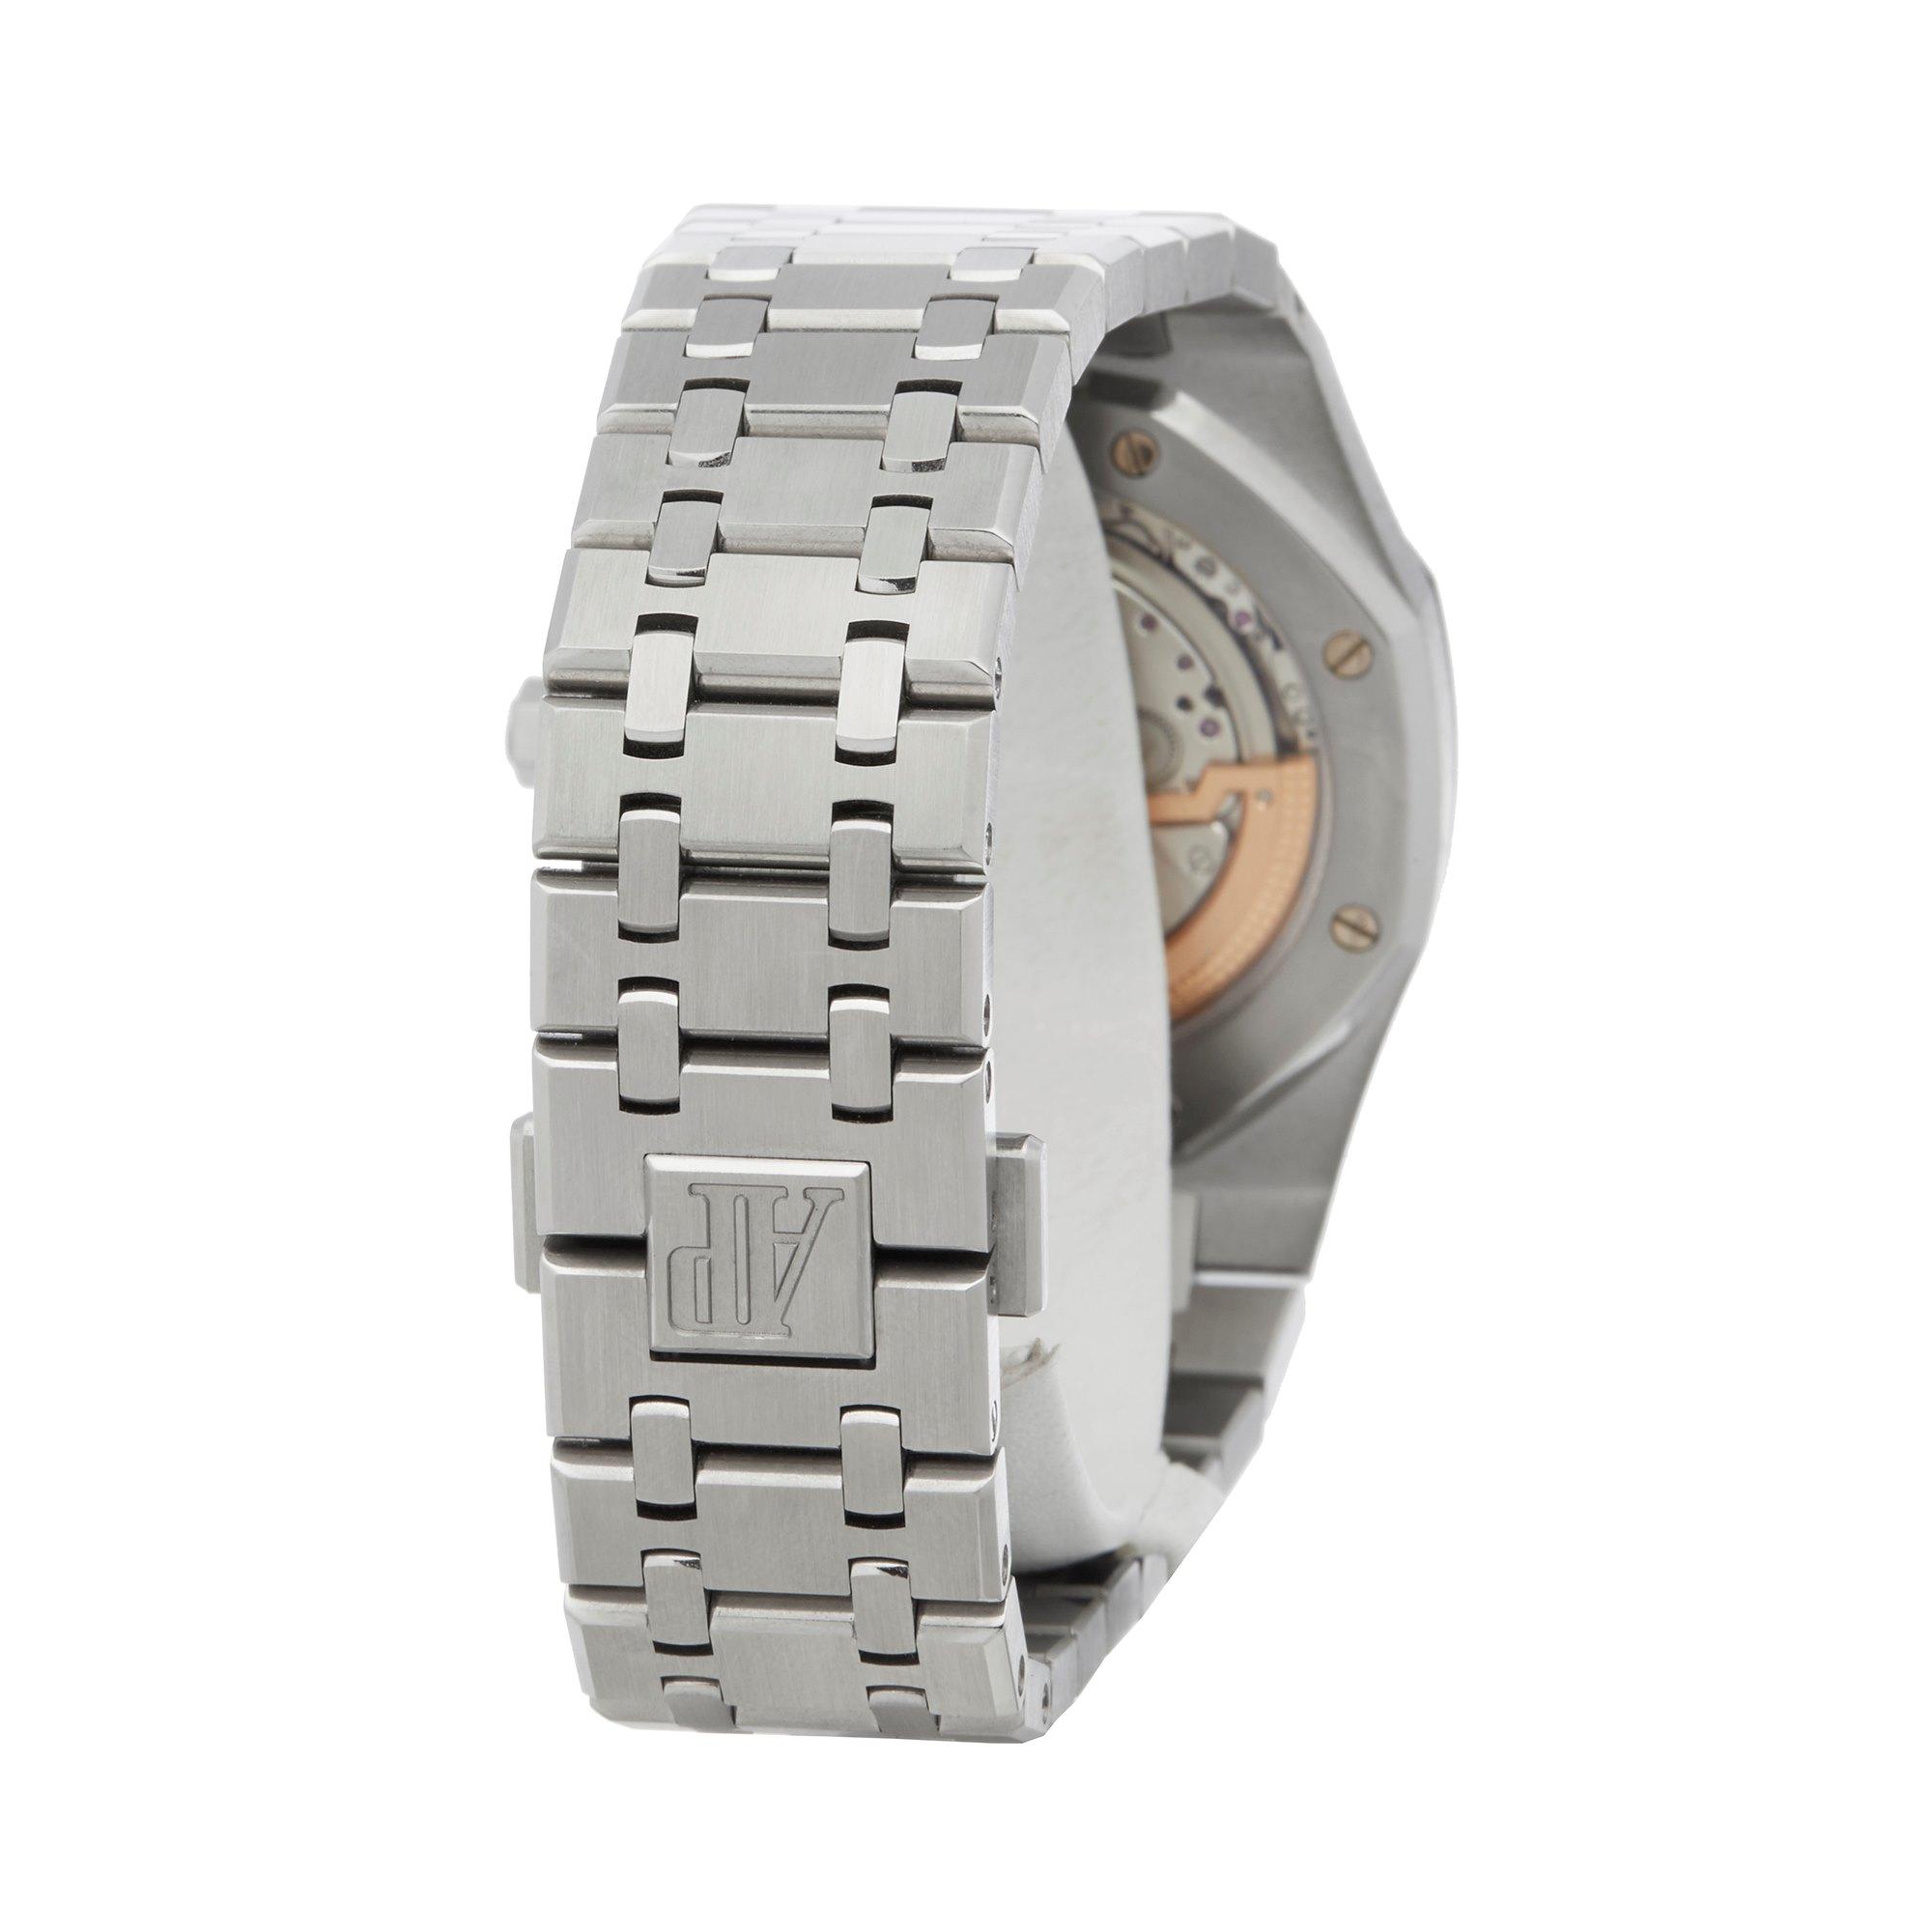 Lot 26 - Audemars Piguet Royal Oak Boutique Jumbo Ultra Thin Stainless Steel - 15202ST.OO.1240ST.01